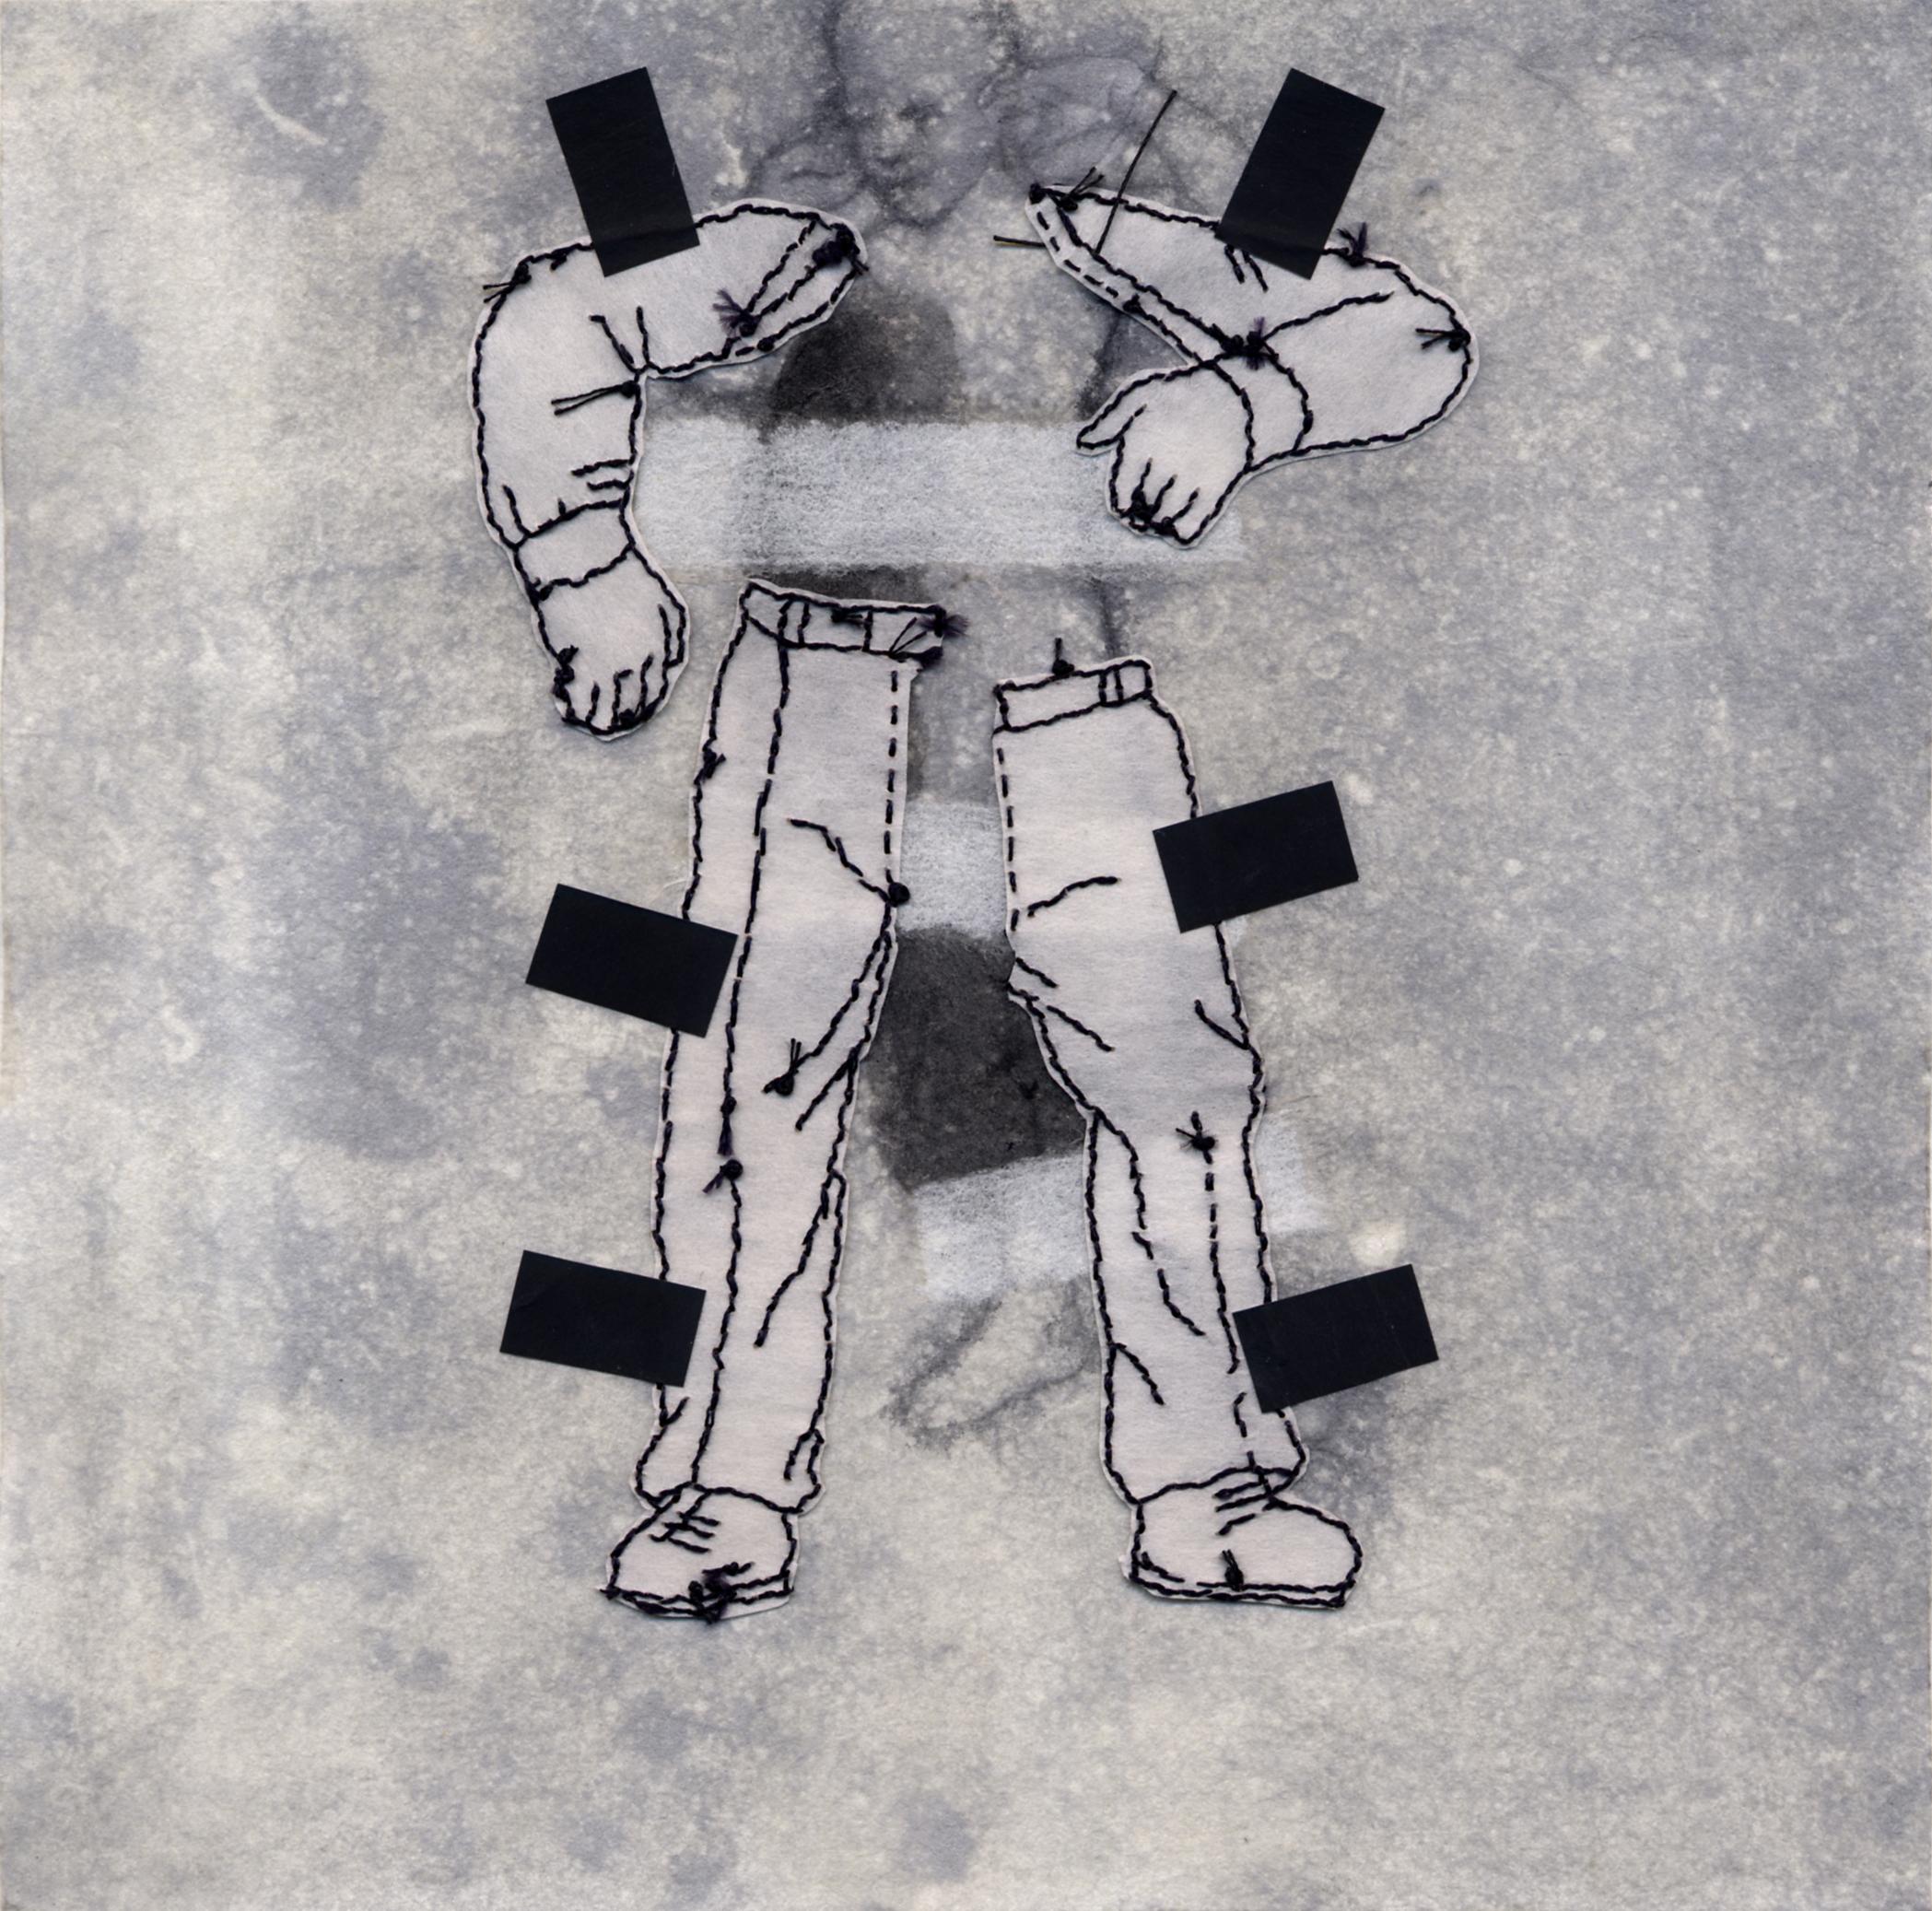 taped boy